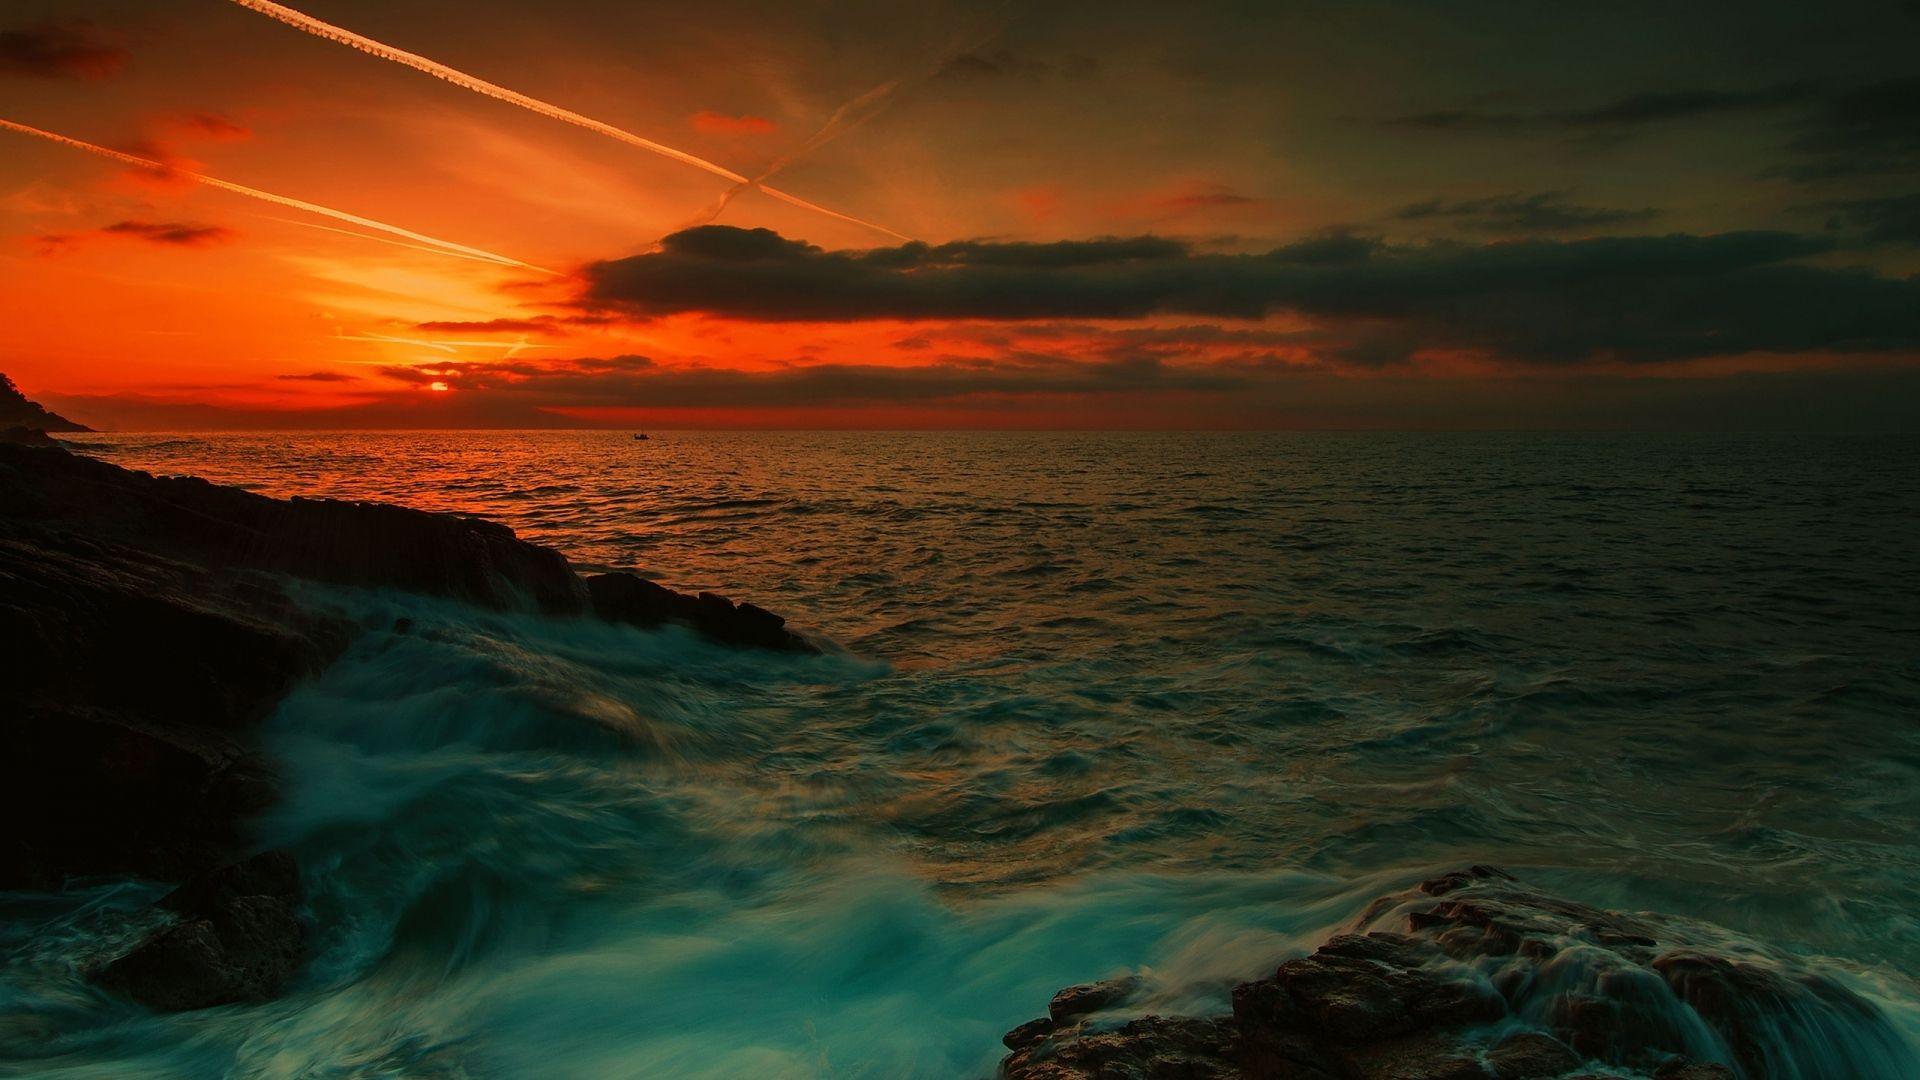 Download Wallpaper 1920x1080 Sea Waves Night Rocks Full Hd 1080p Hd Background Beach Desktop Backgrounds Sunset Wallpaper 1920x1080